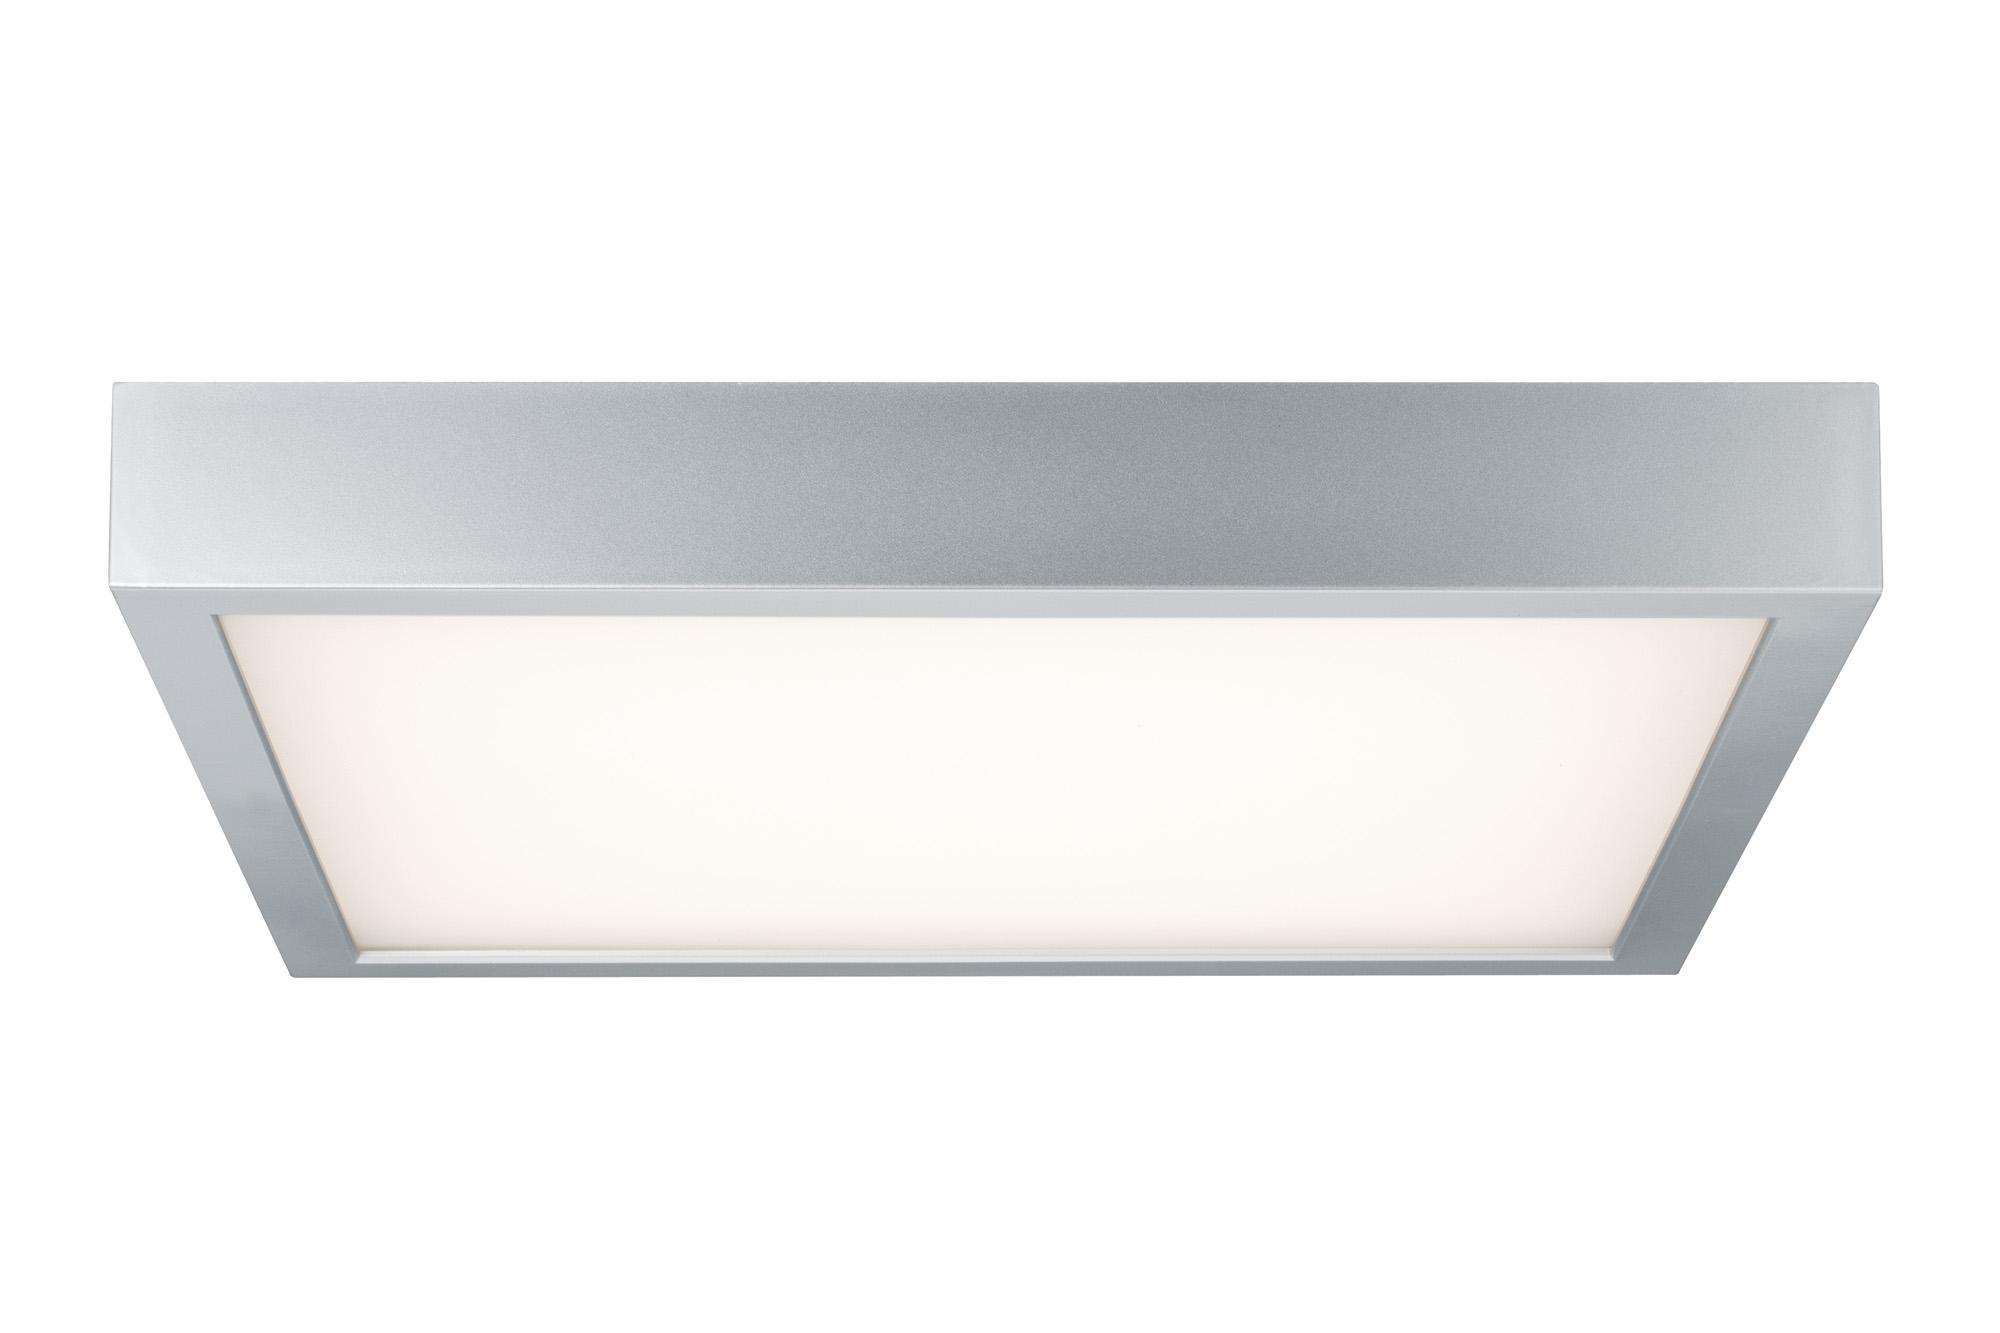 wand deckenleuchte space led panel 18 5w chrom matt wei kunststoff 70385. Black Bedroom Furniture Sets. Home Design Ideas